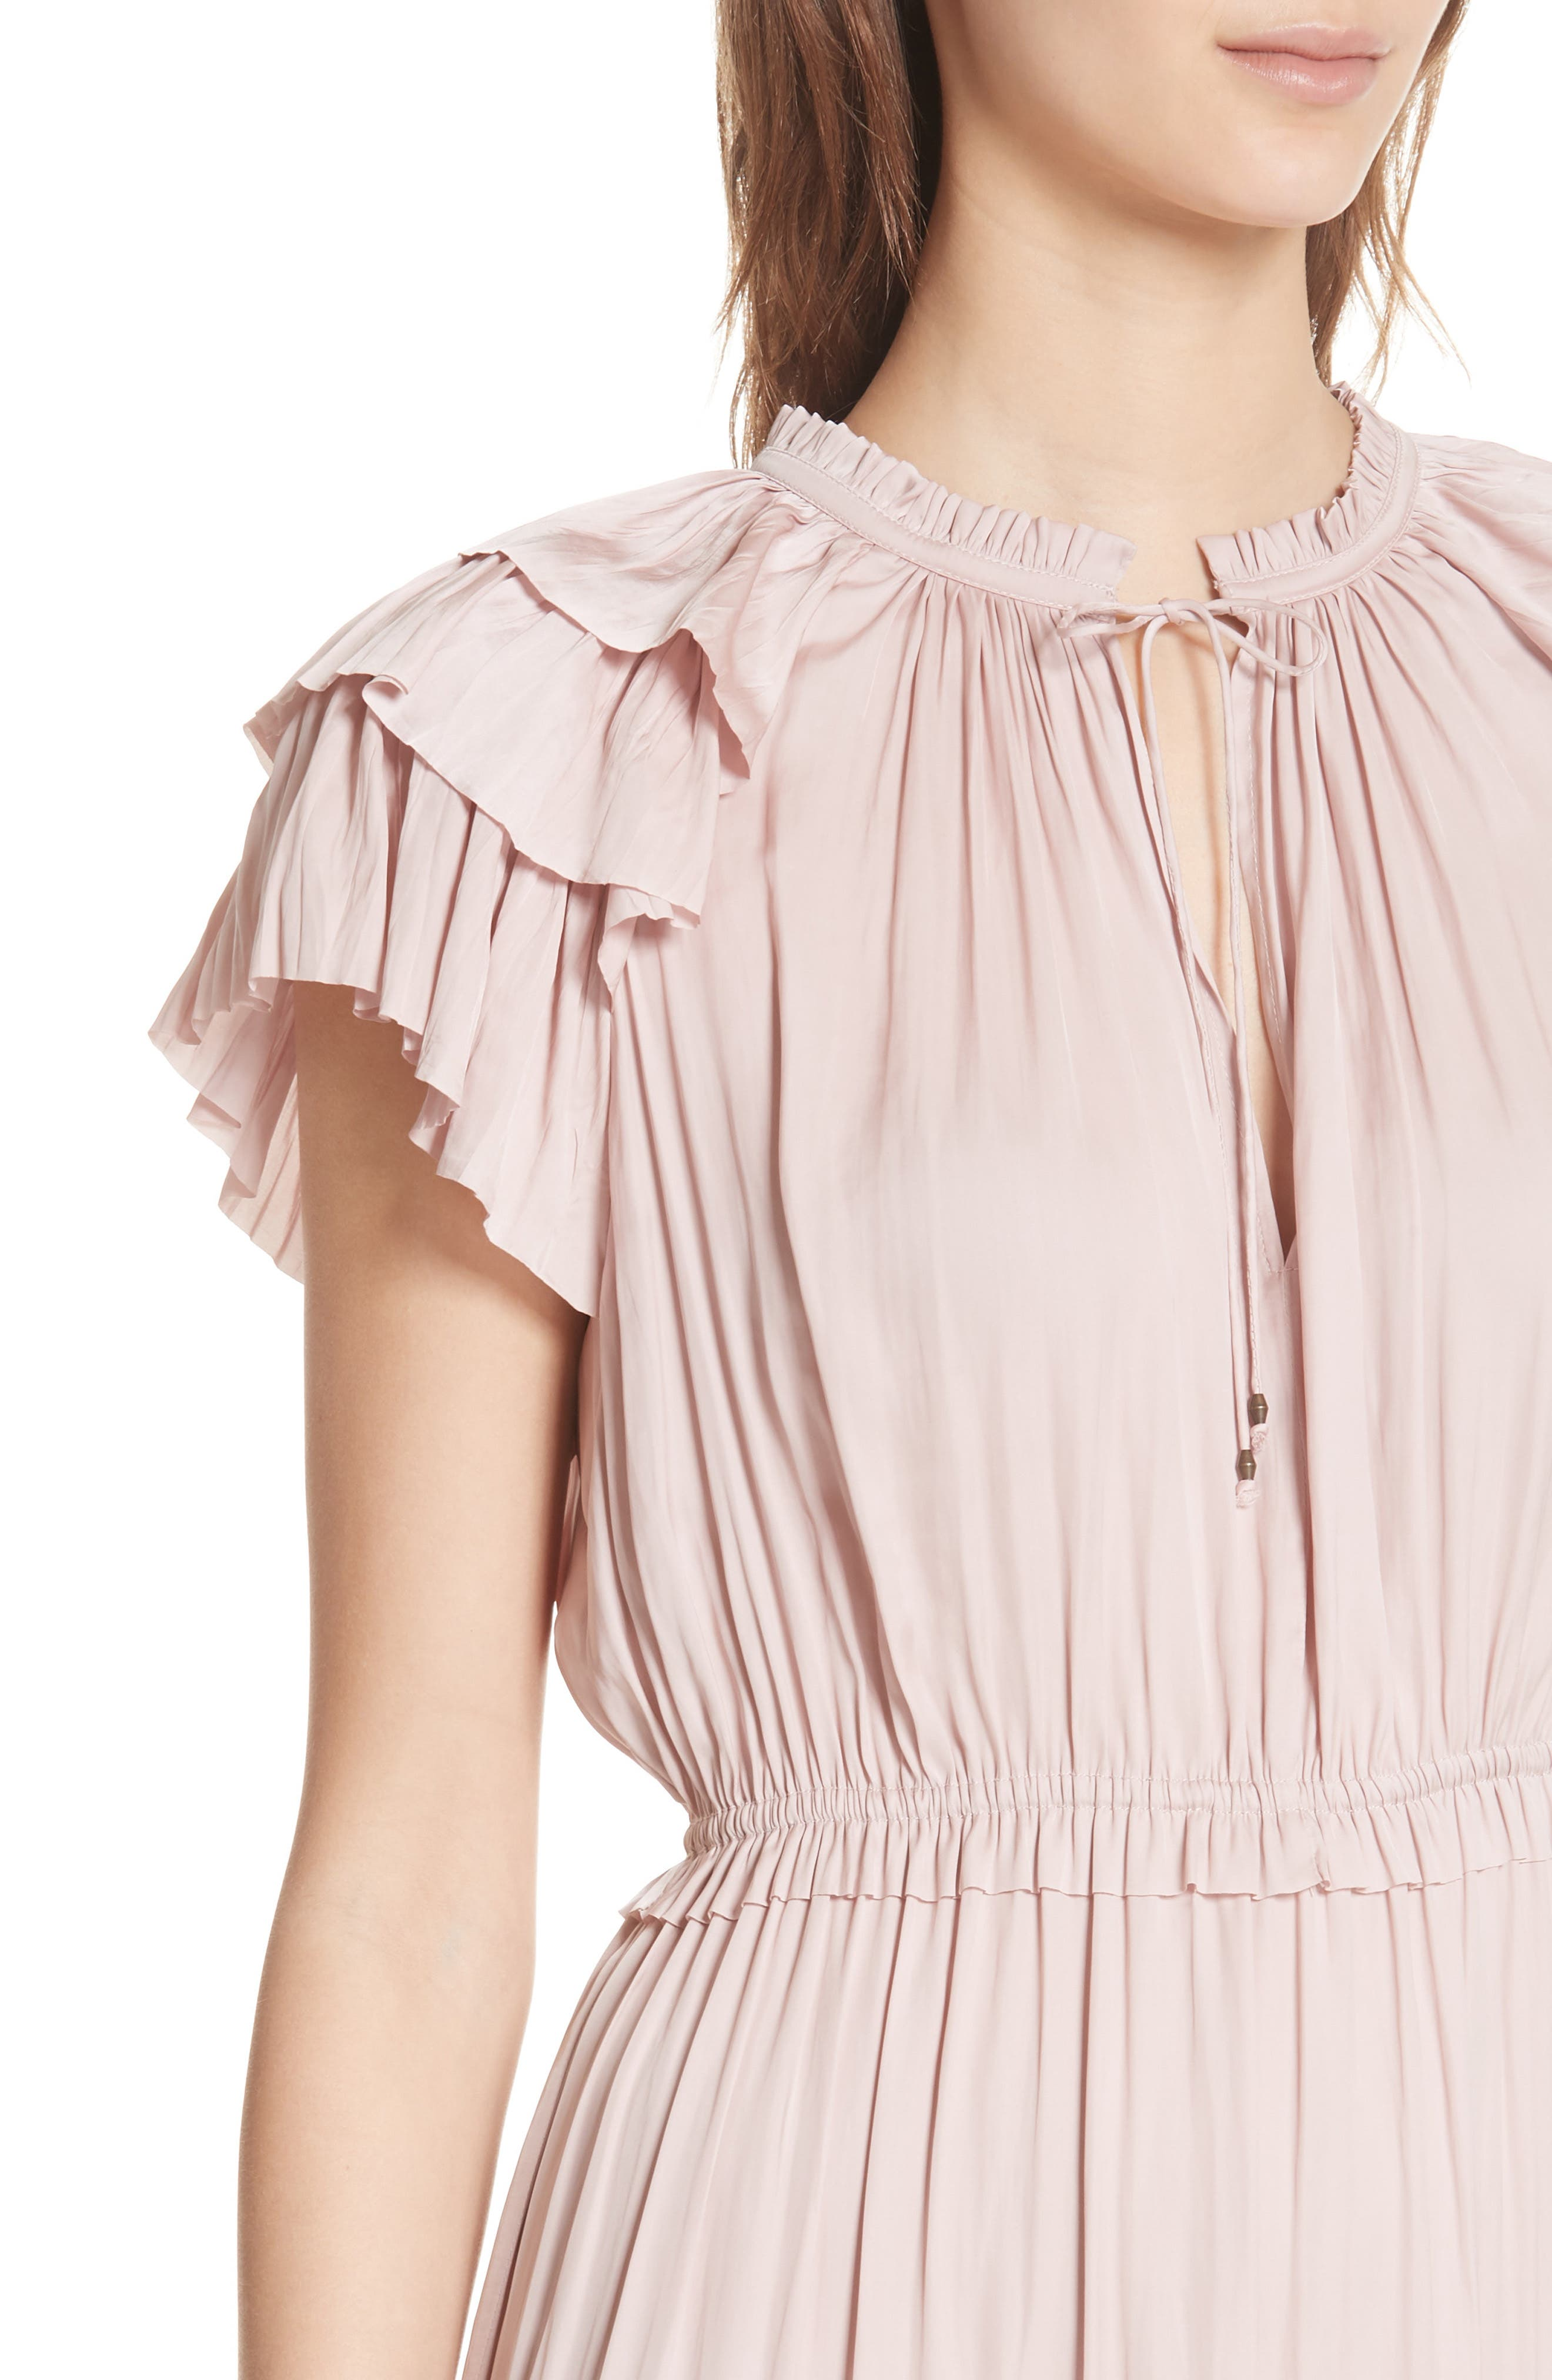 Blaire Satin Dress,                             Alternate thumbnail 4, color,                             600